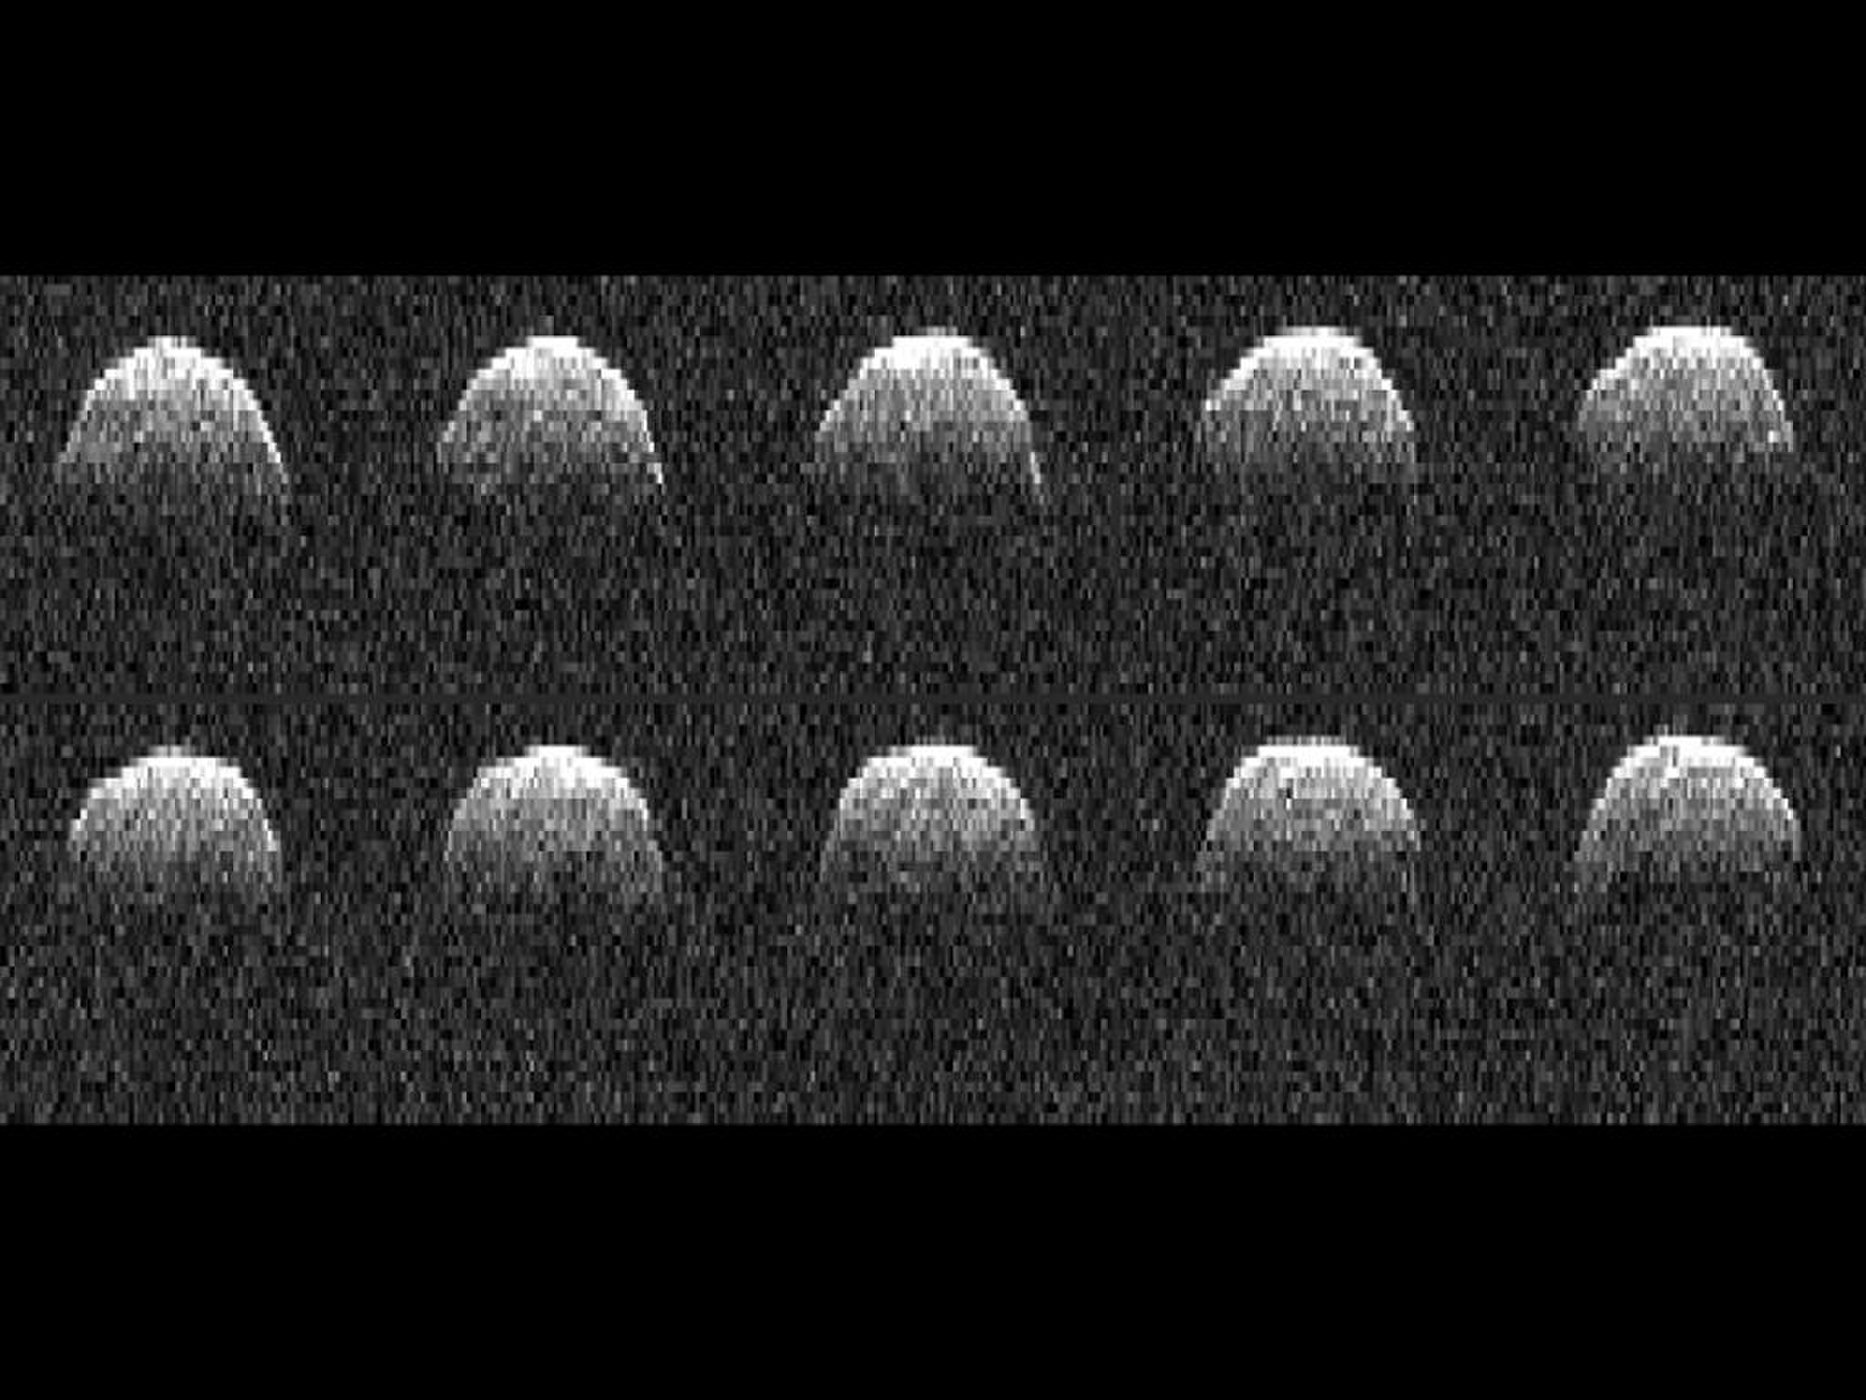 asteroid 1999 rq36 - 946×710